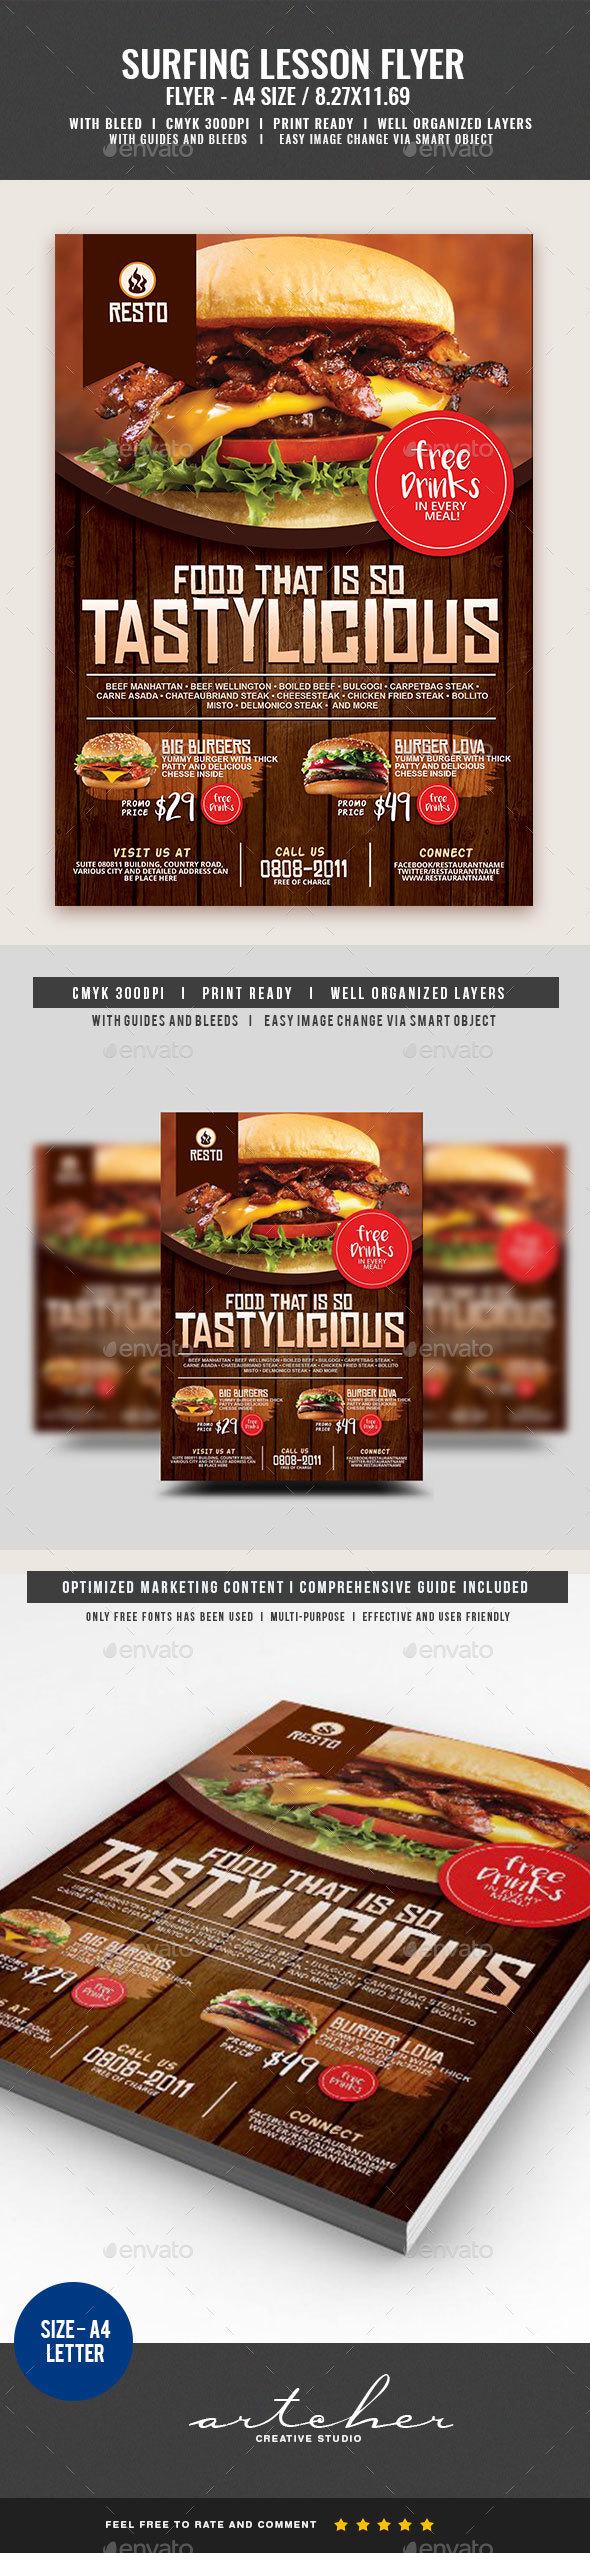 Restaurant Burger House Flyer